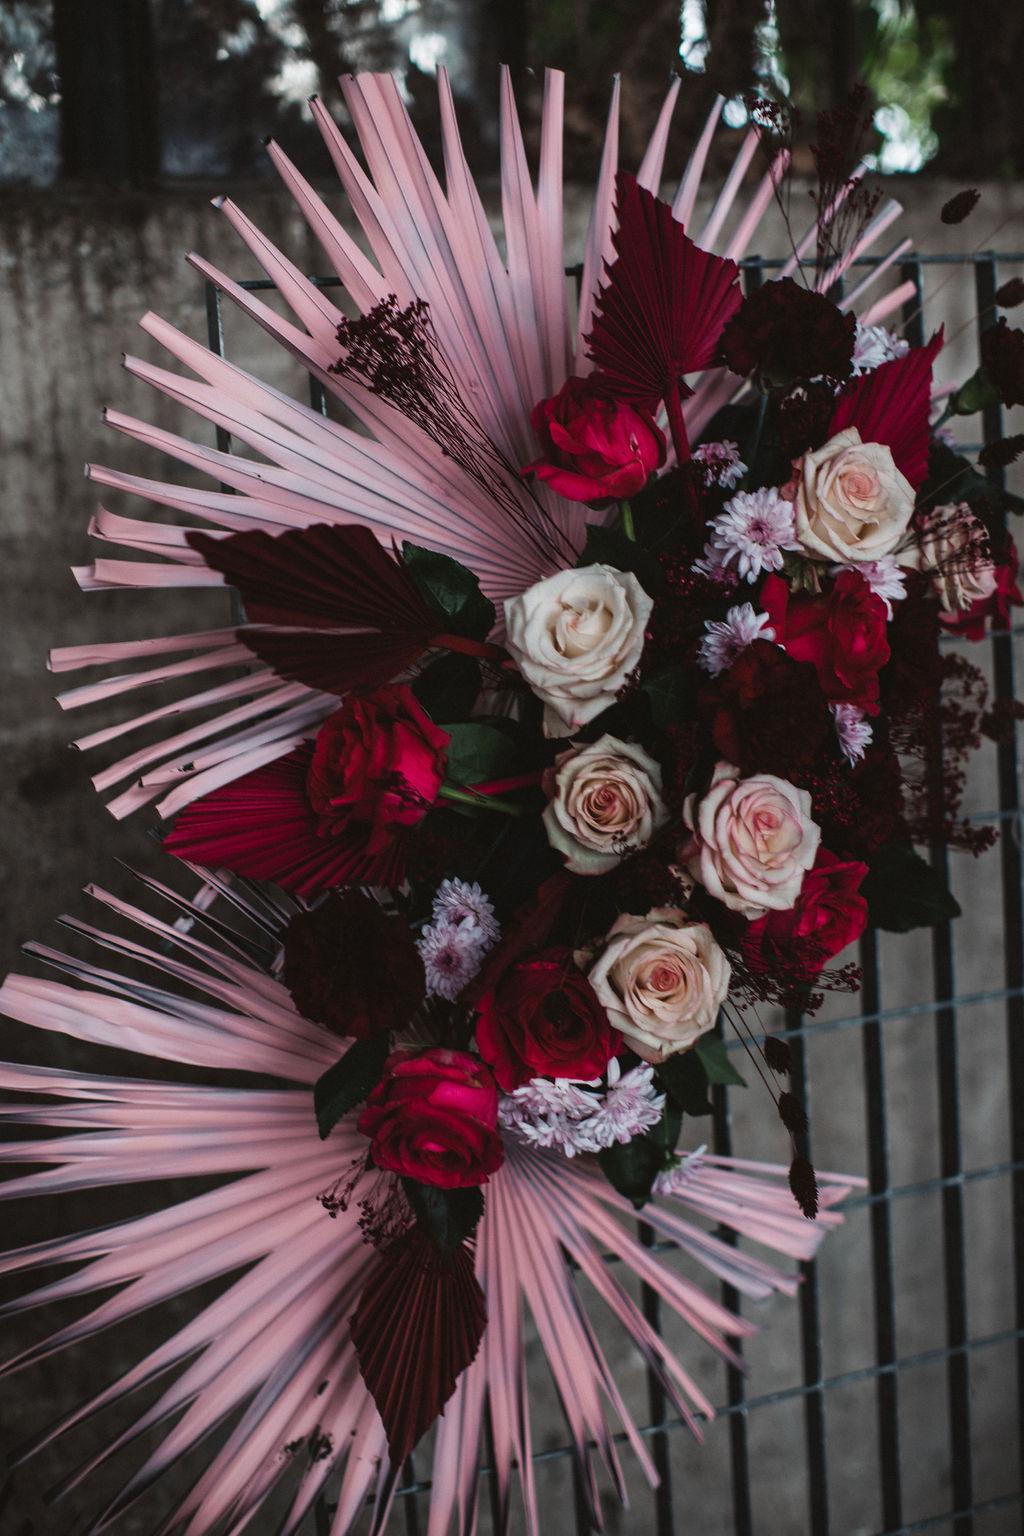 modern industrial wedding - alternative wedding - unconventional wedding - edgy wedding - unique wedding flowers - alternative wedding flowers - pink wedding flowers